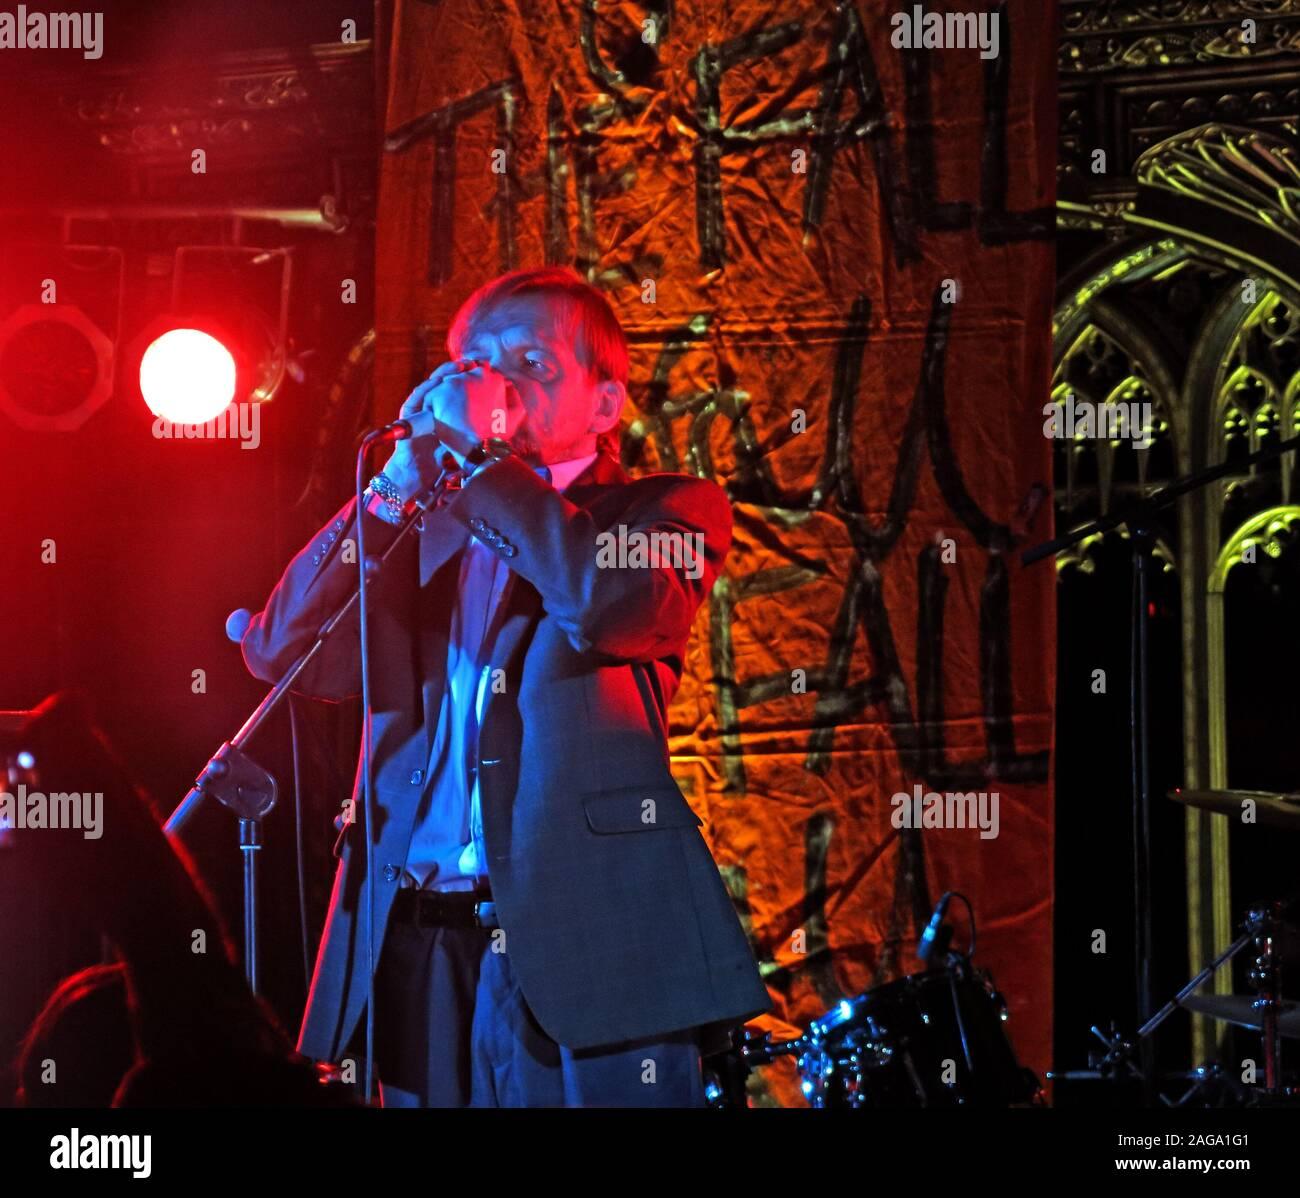 Mark E Smith & The Fall perform 15/05/2014 Manchester Cathedral gig - Mark.E.Smith Stock Photo